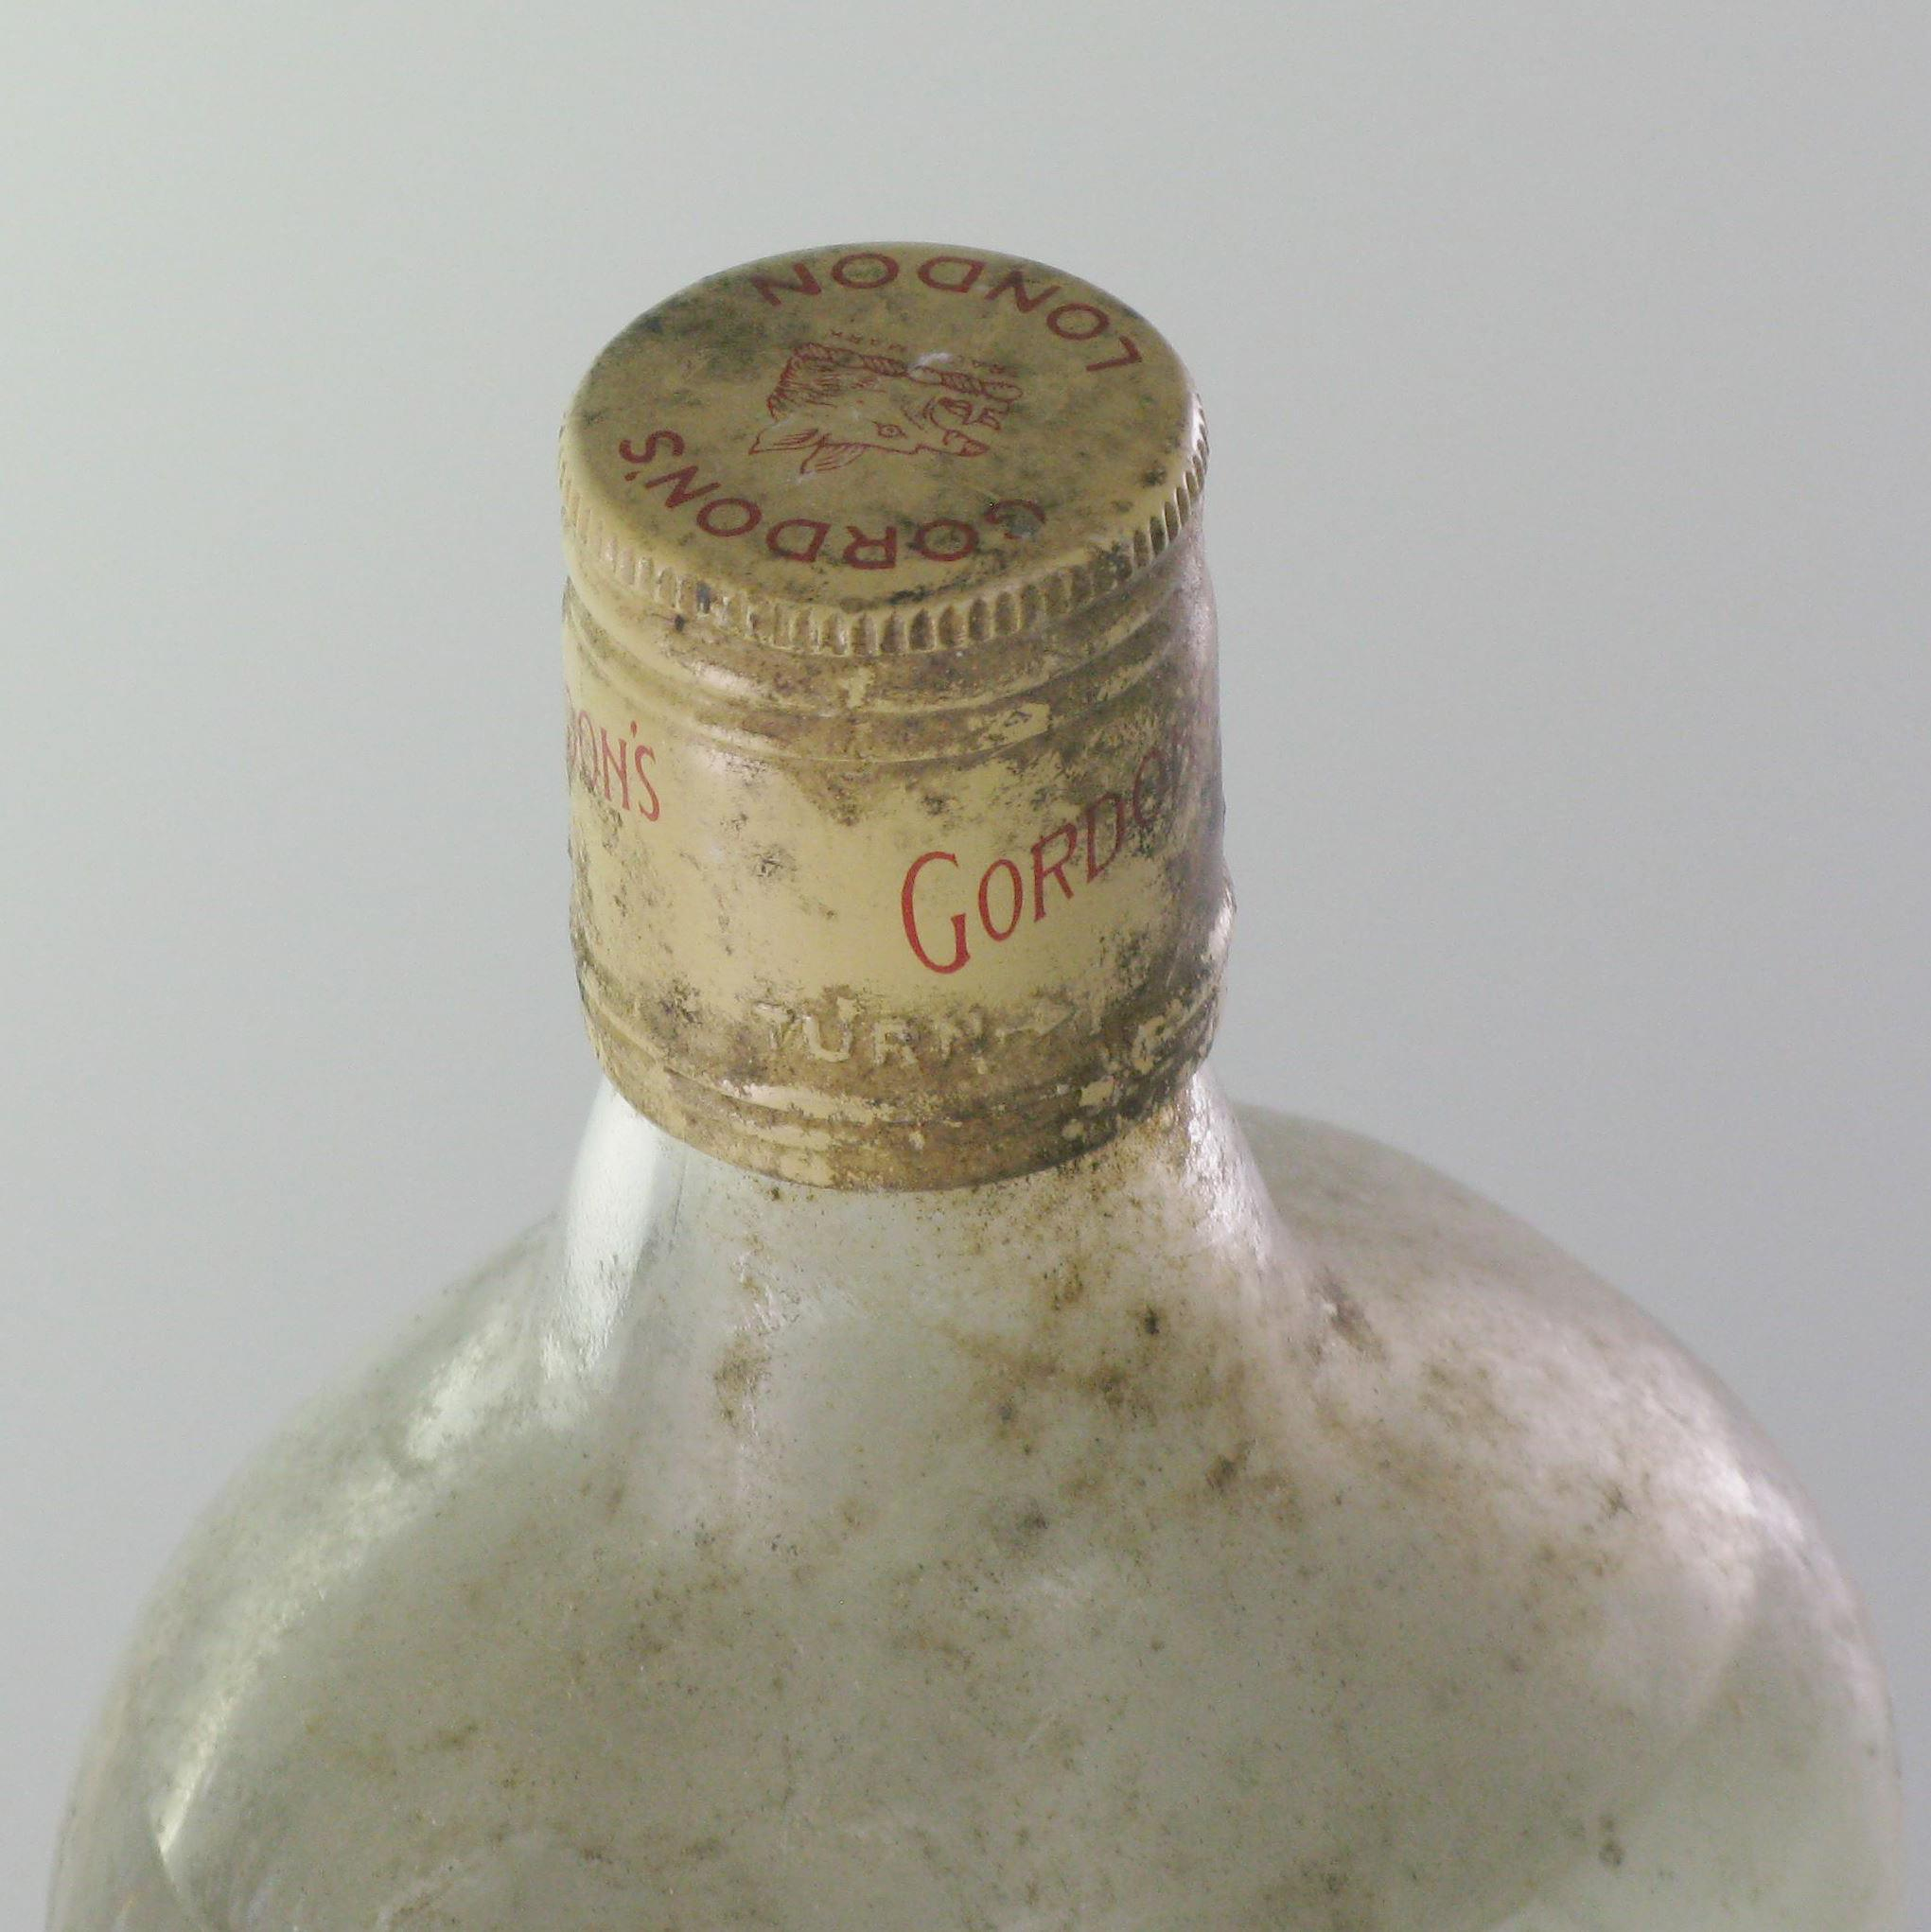 Gordon's London Dry Gin 1970s